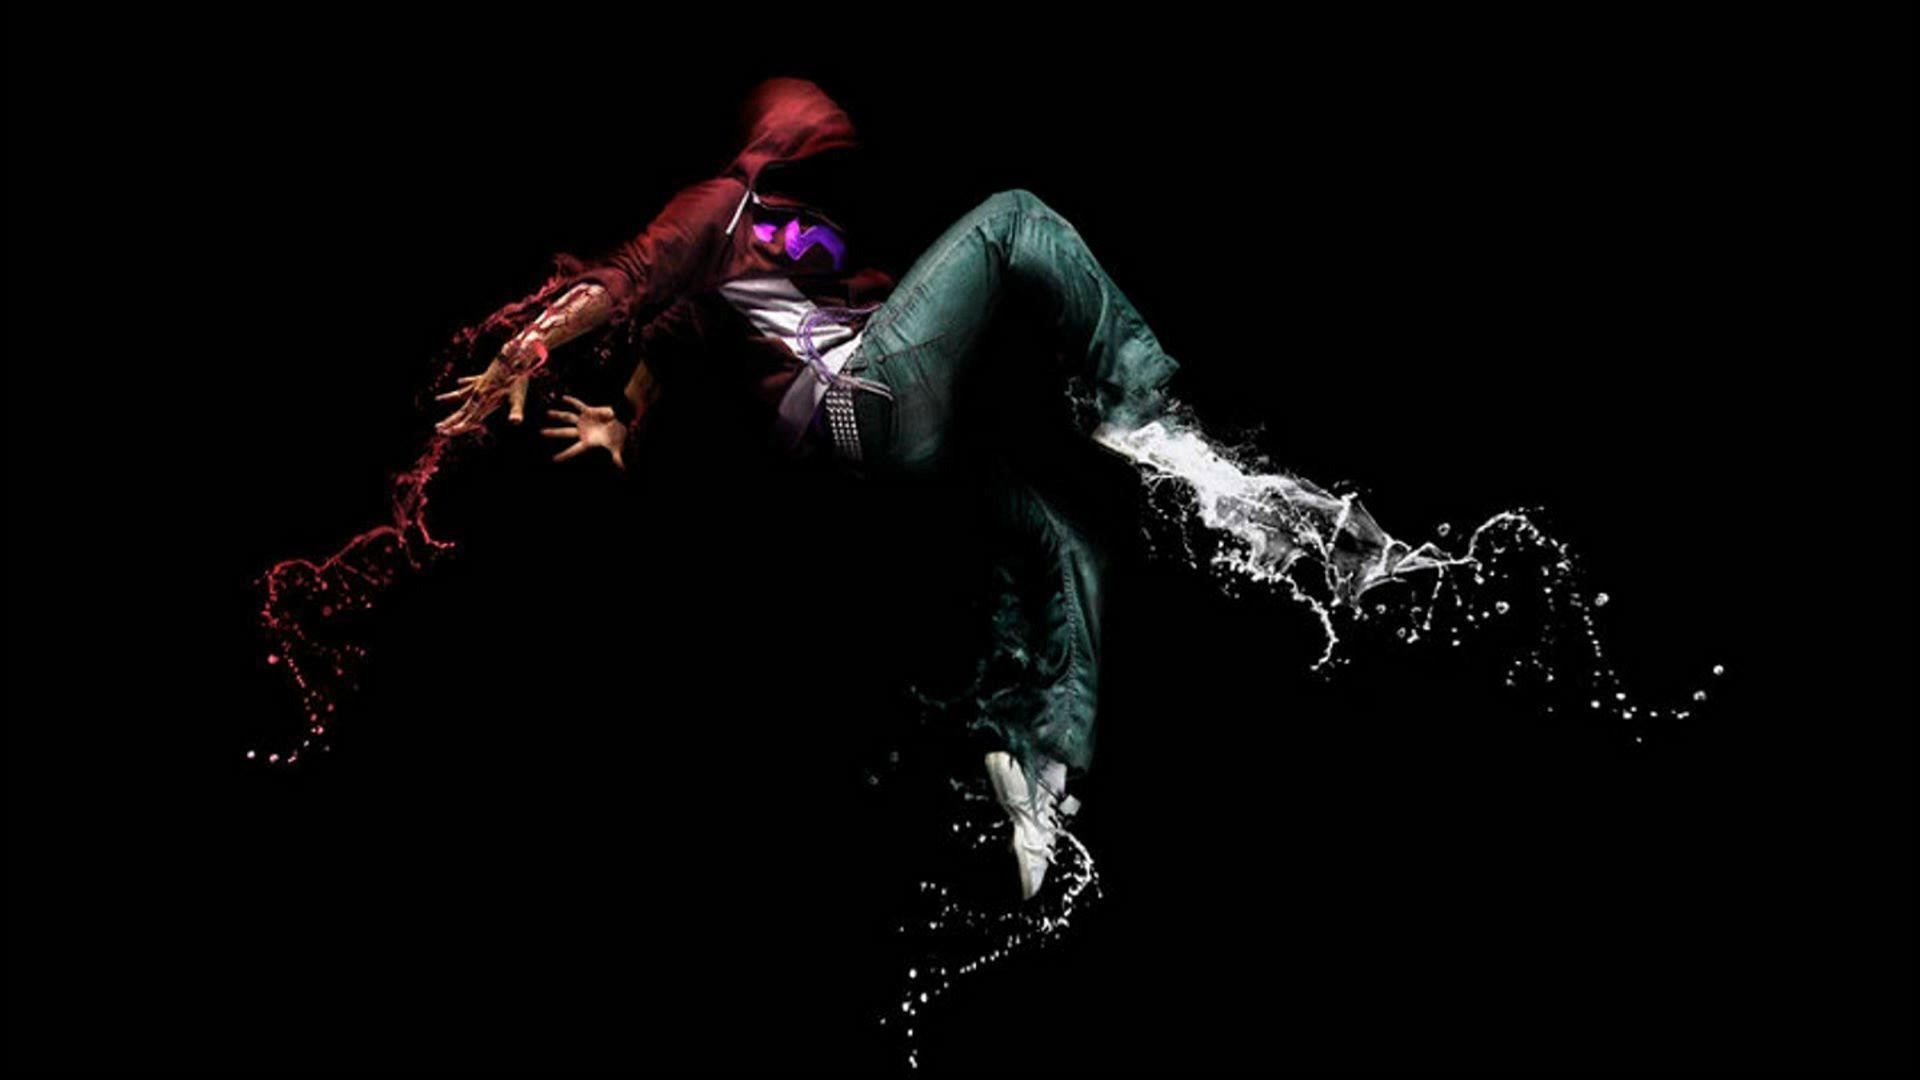 dance wallpaper cool girl - photo #10